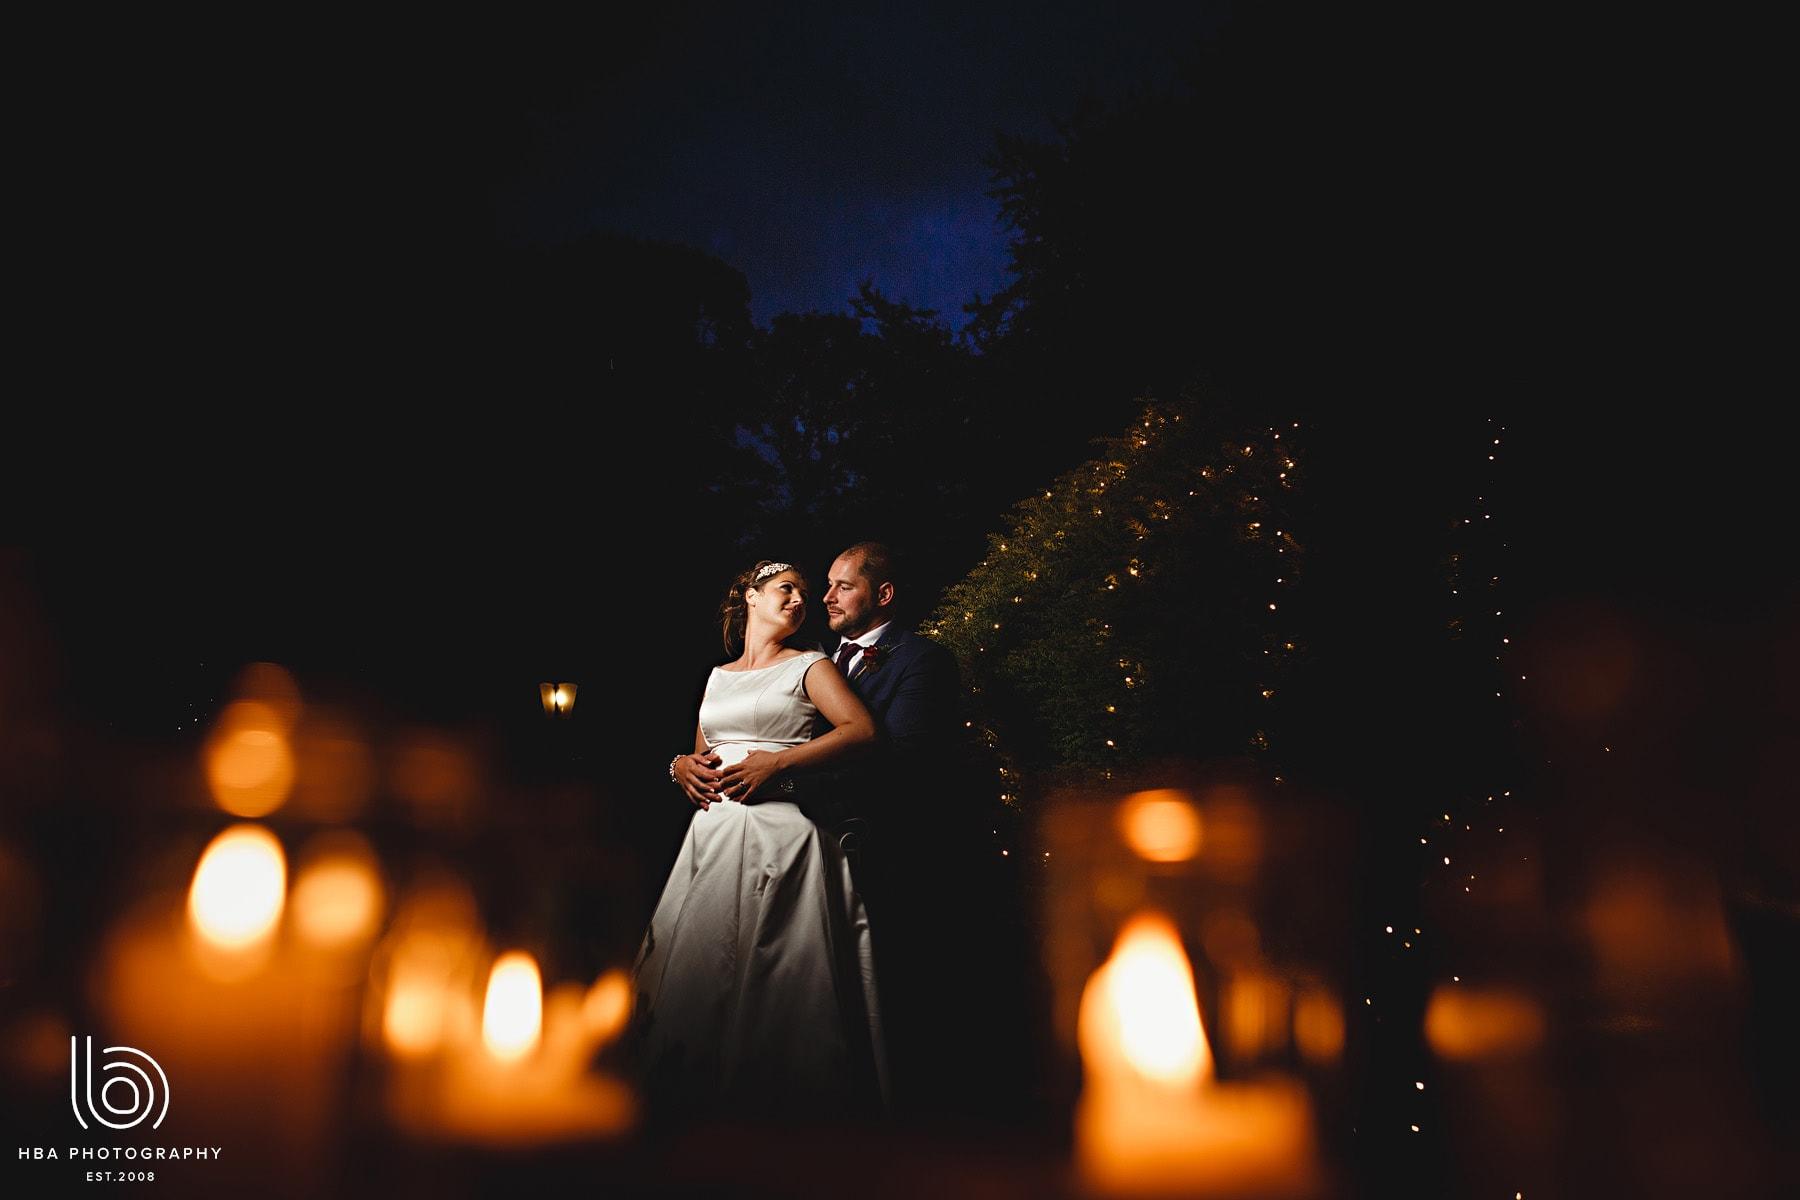 the bride & groom in the twinkle lights